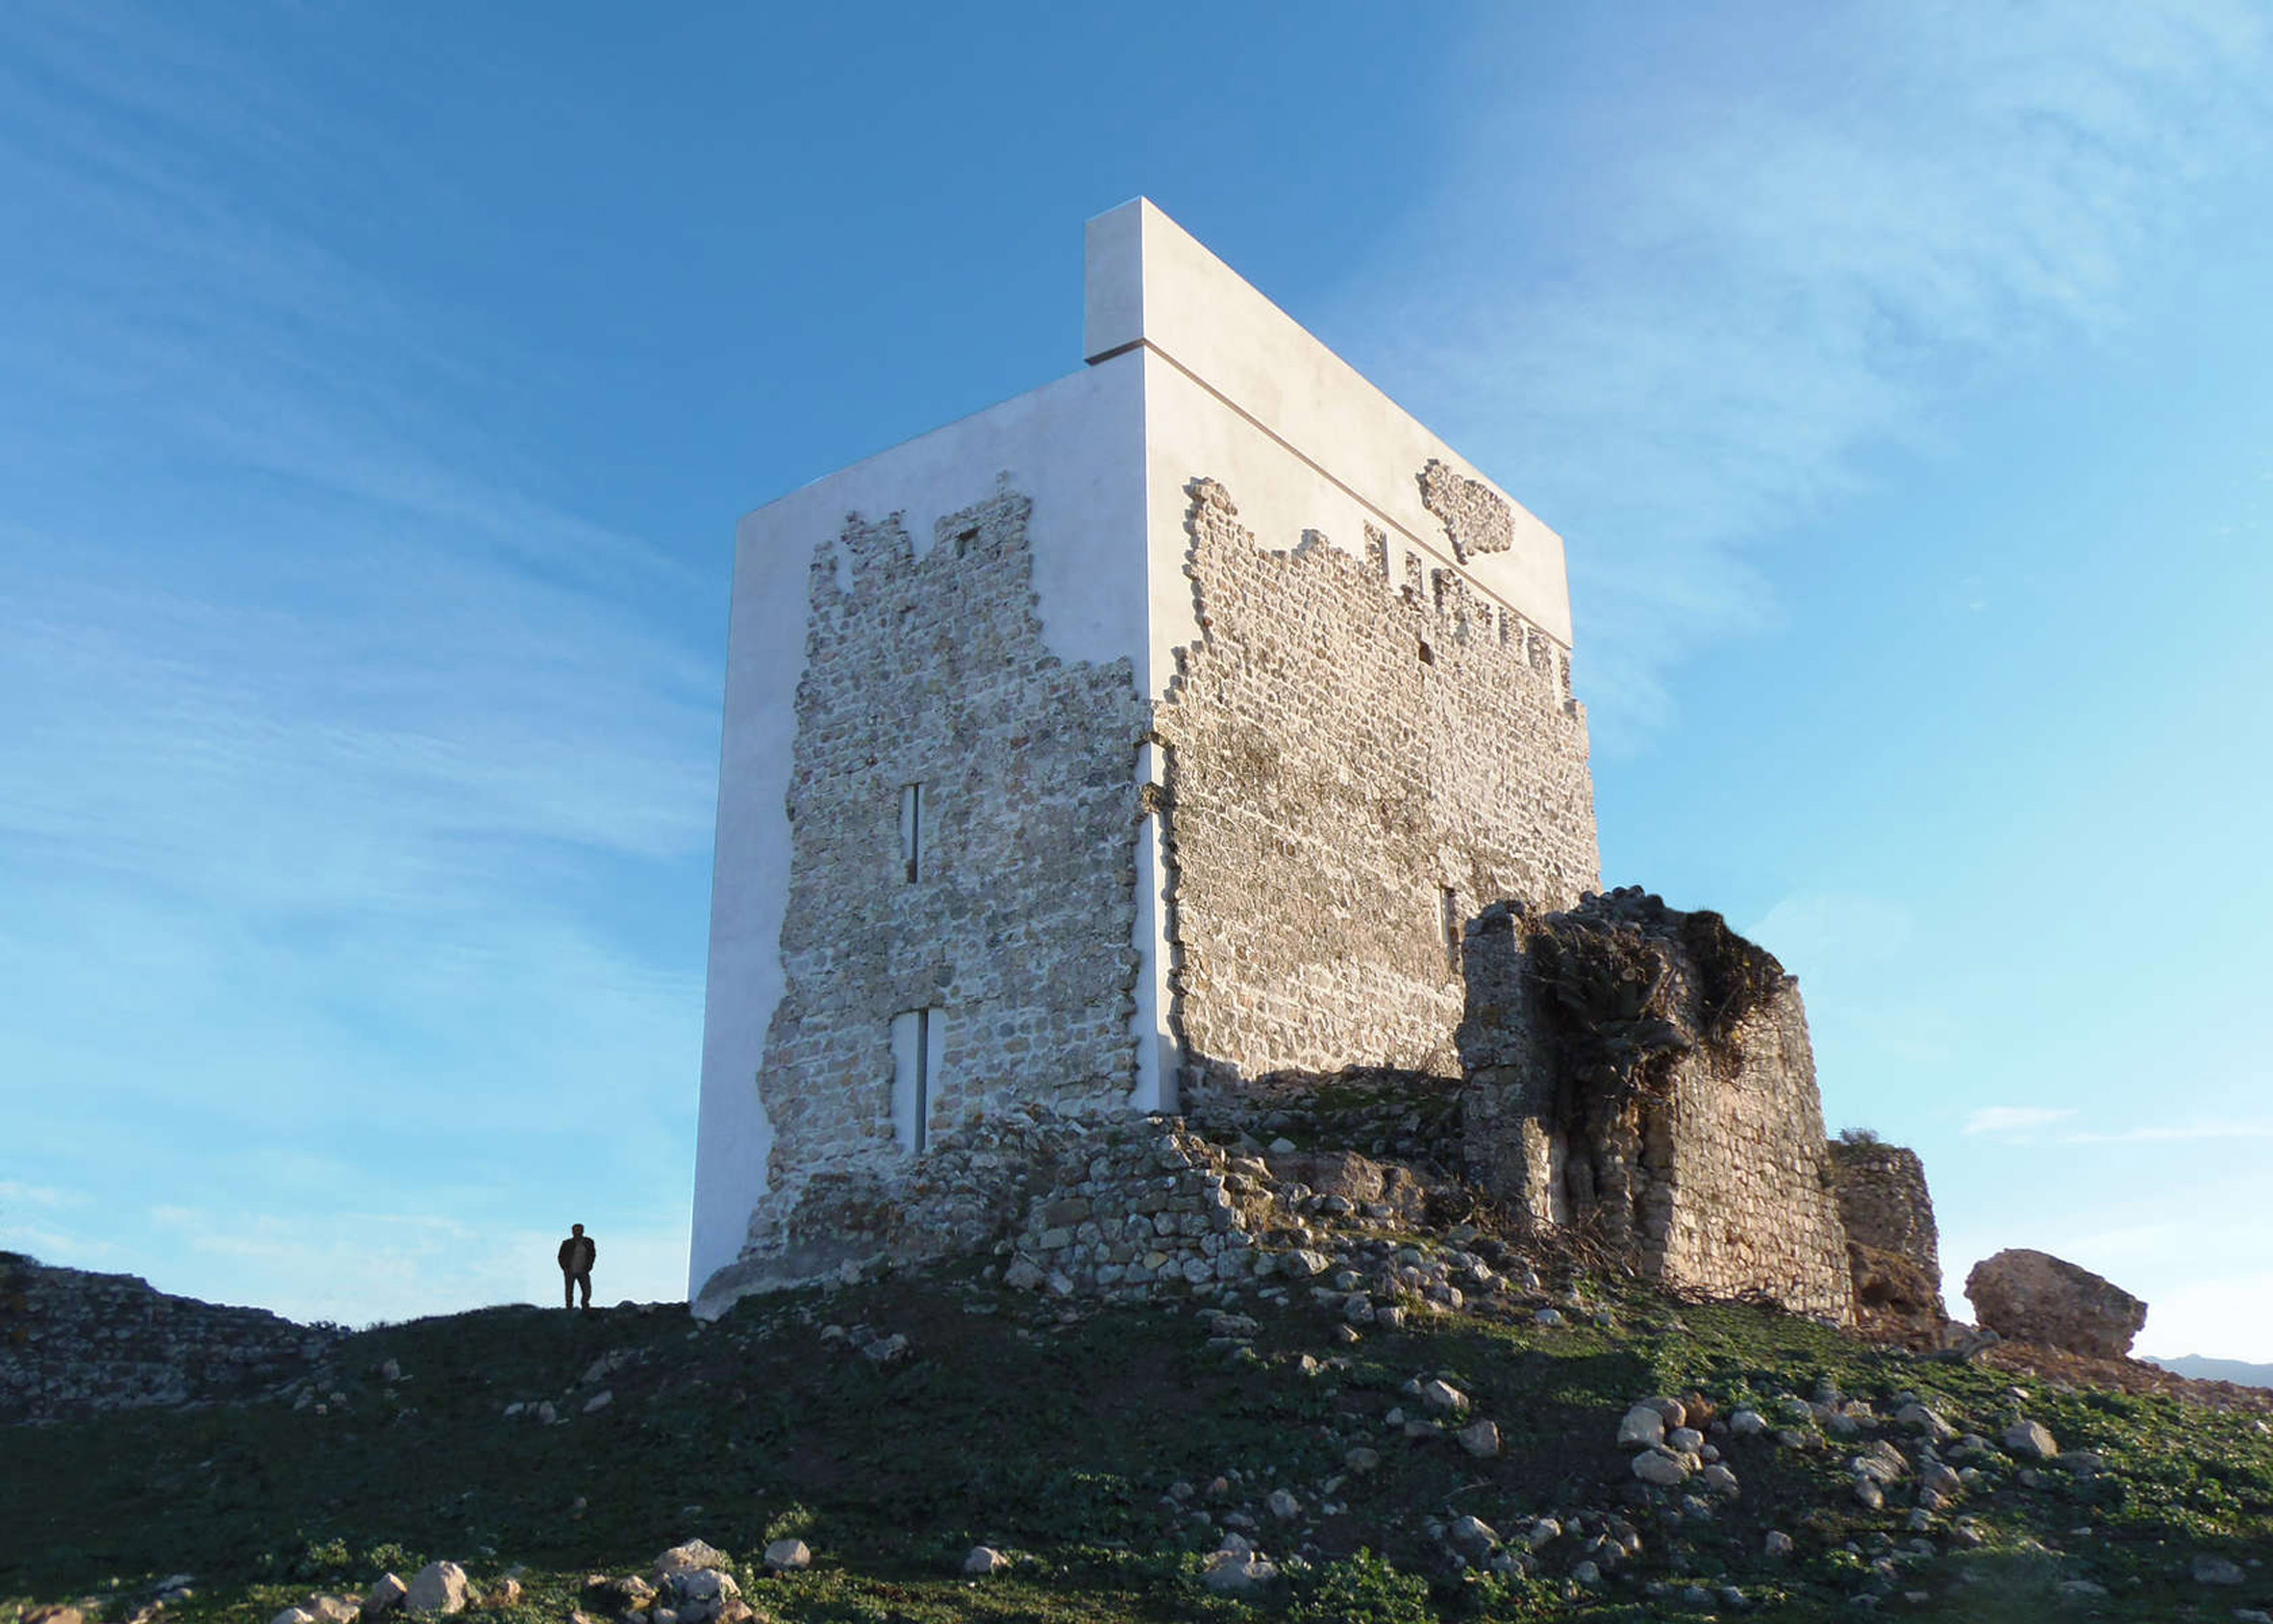 Restoration of Matrera Castle, Spain by Carquero Arquitectura